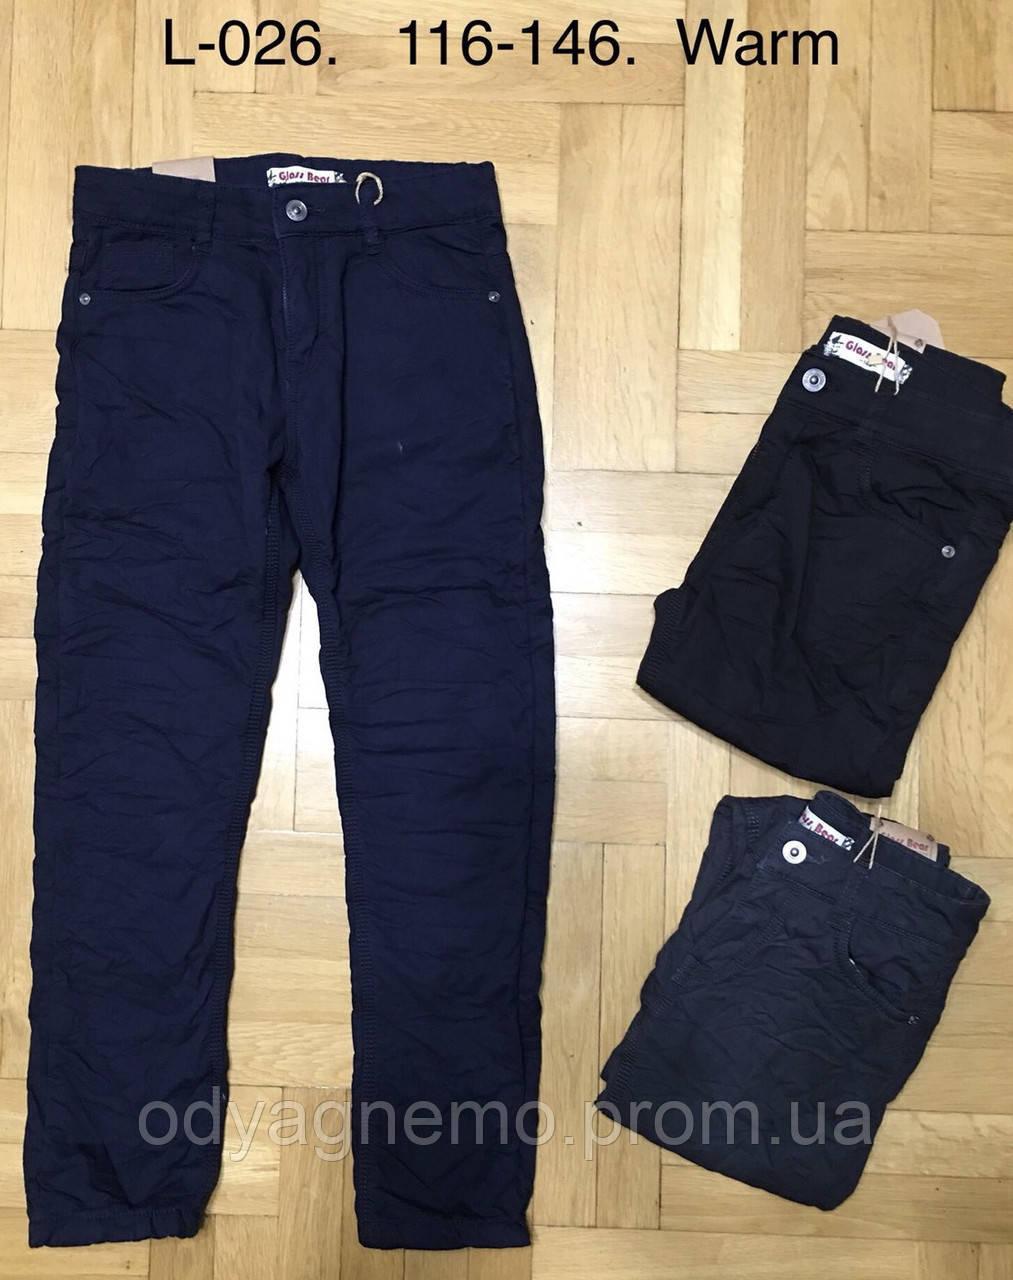 Котоновые брюки на флисе для мальчиков Glass Bear оптом,116-146 рр. Артикул: L026